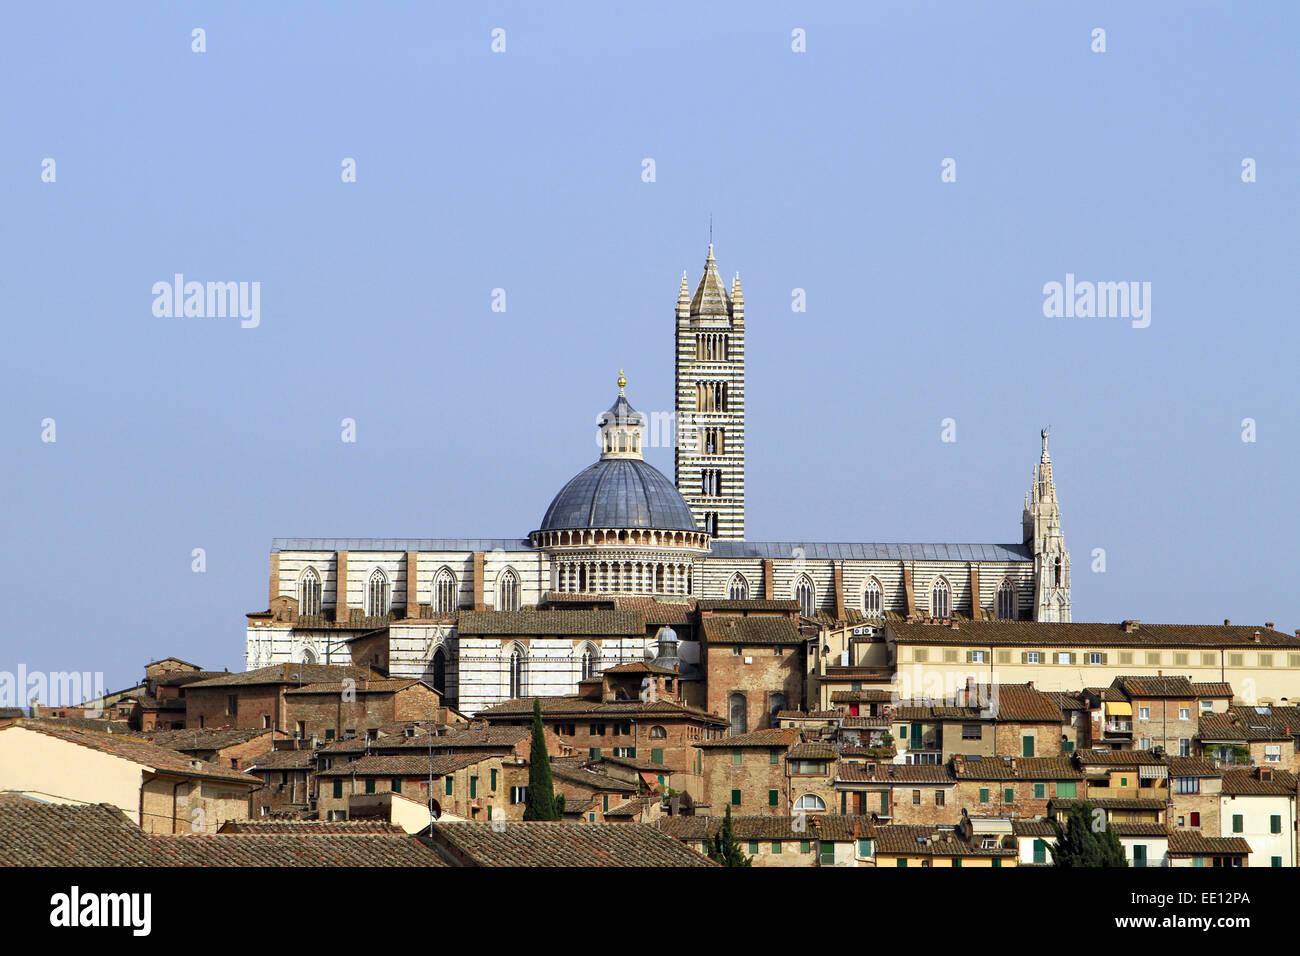 Italien, Toskana, Siena, Stadtansicht, Dom, Duomo Santa Maria Assunta - Stock Image